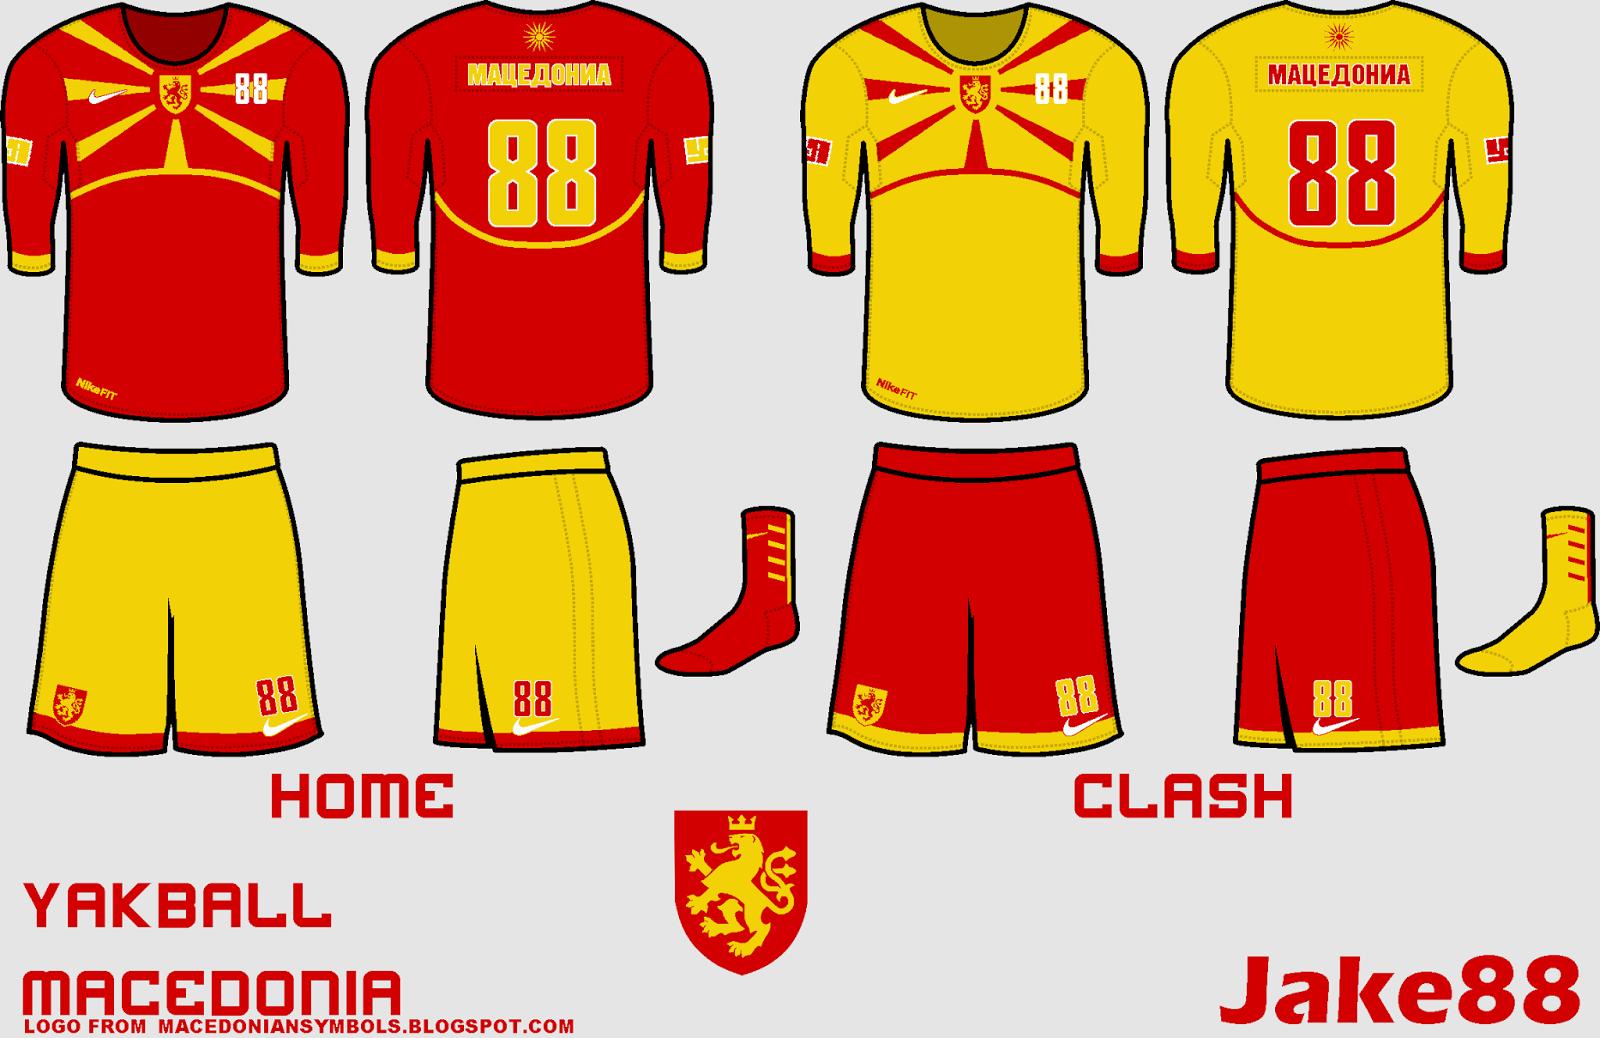 Yakball_Macedonia_Jersey_Concept.png